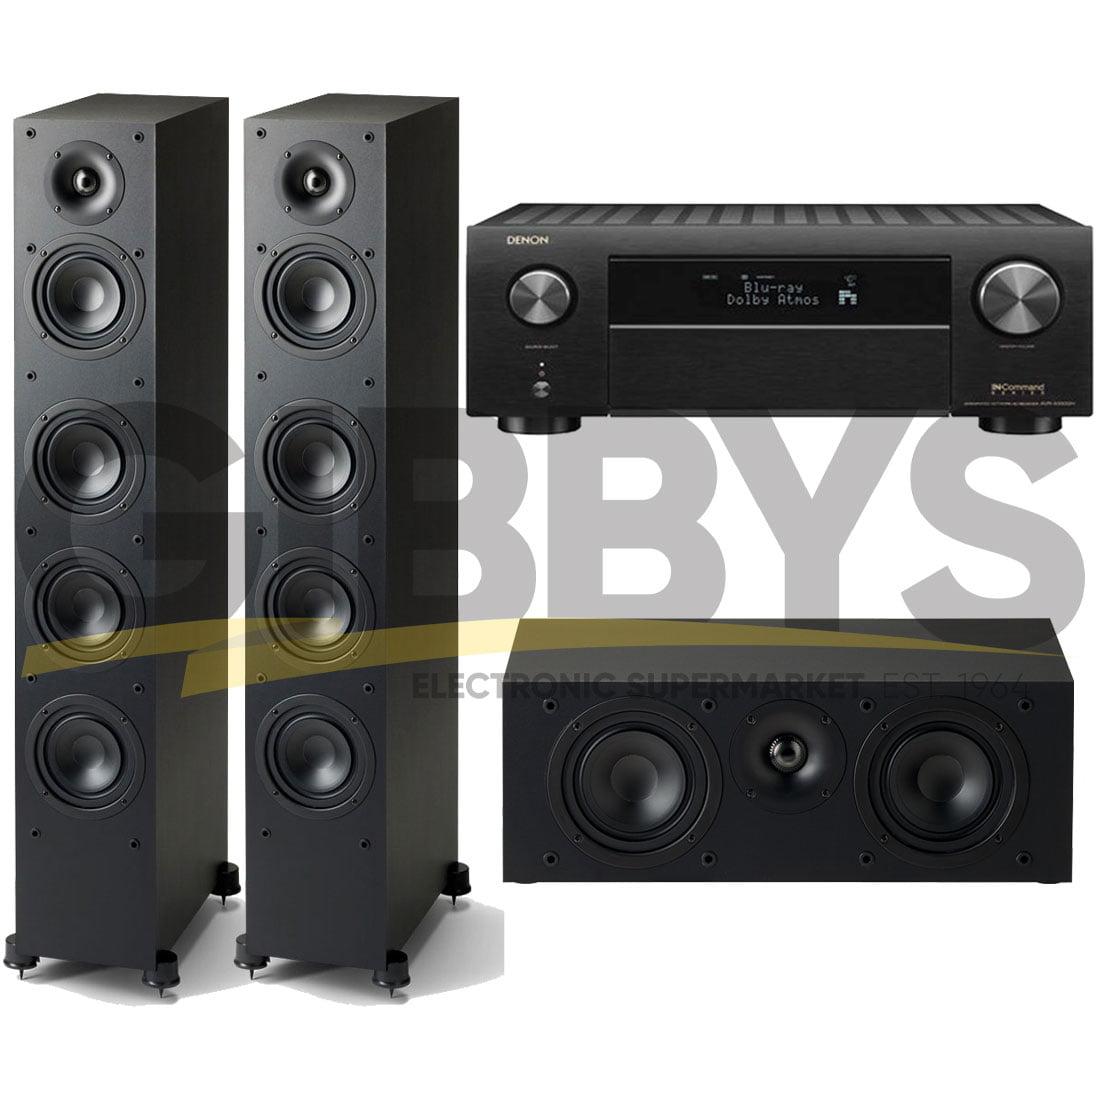 AVRX4500H - MONITOR SE6000F(2) - blk - MONITOR SE2000C - blk - Bundle